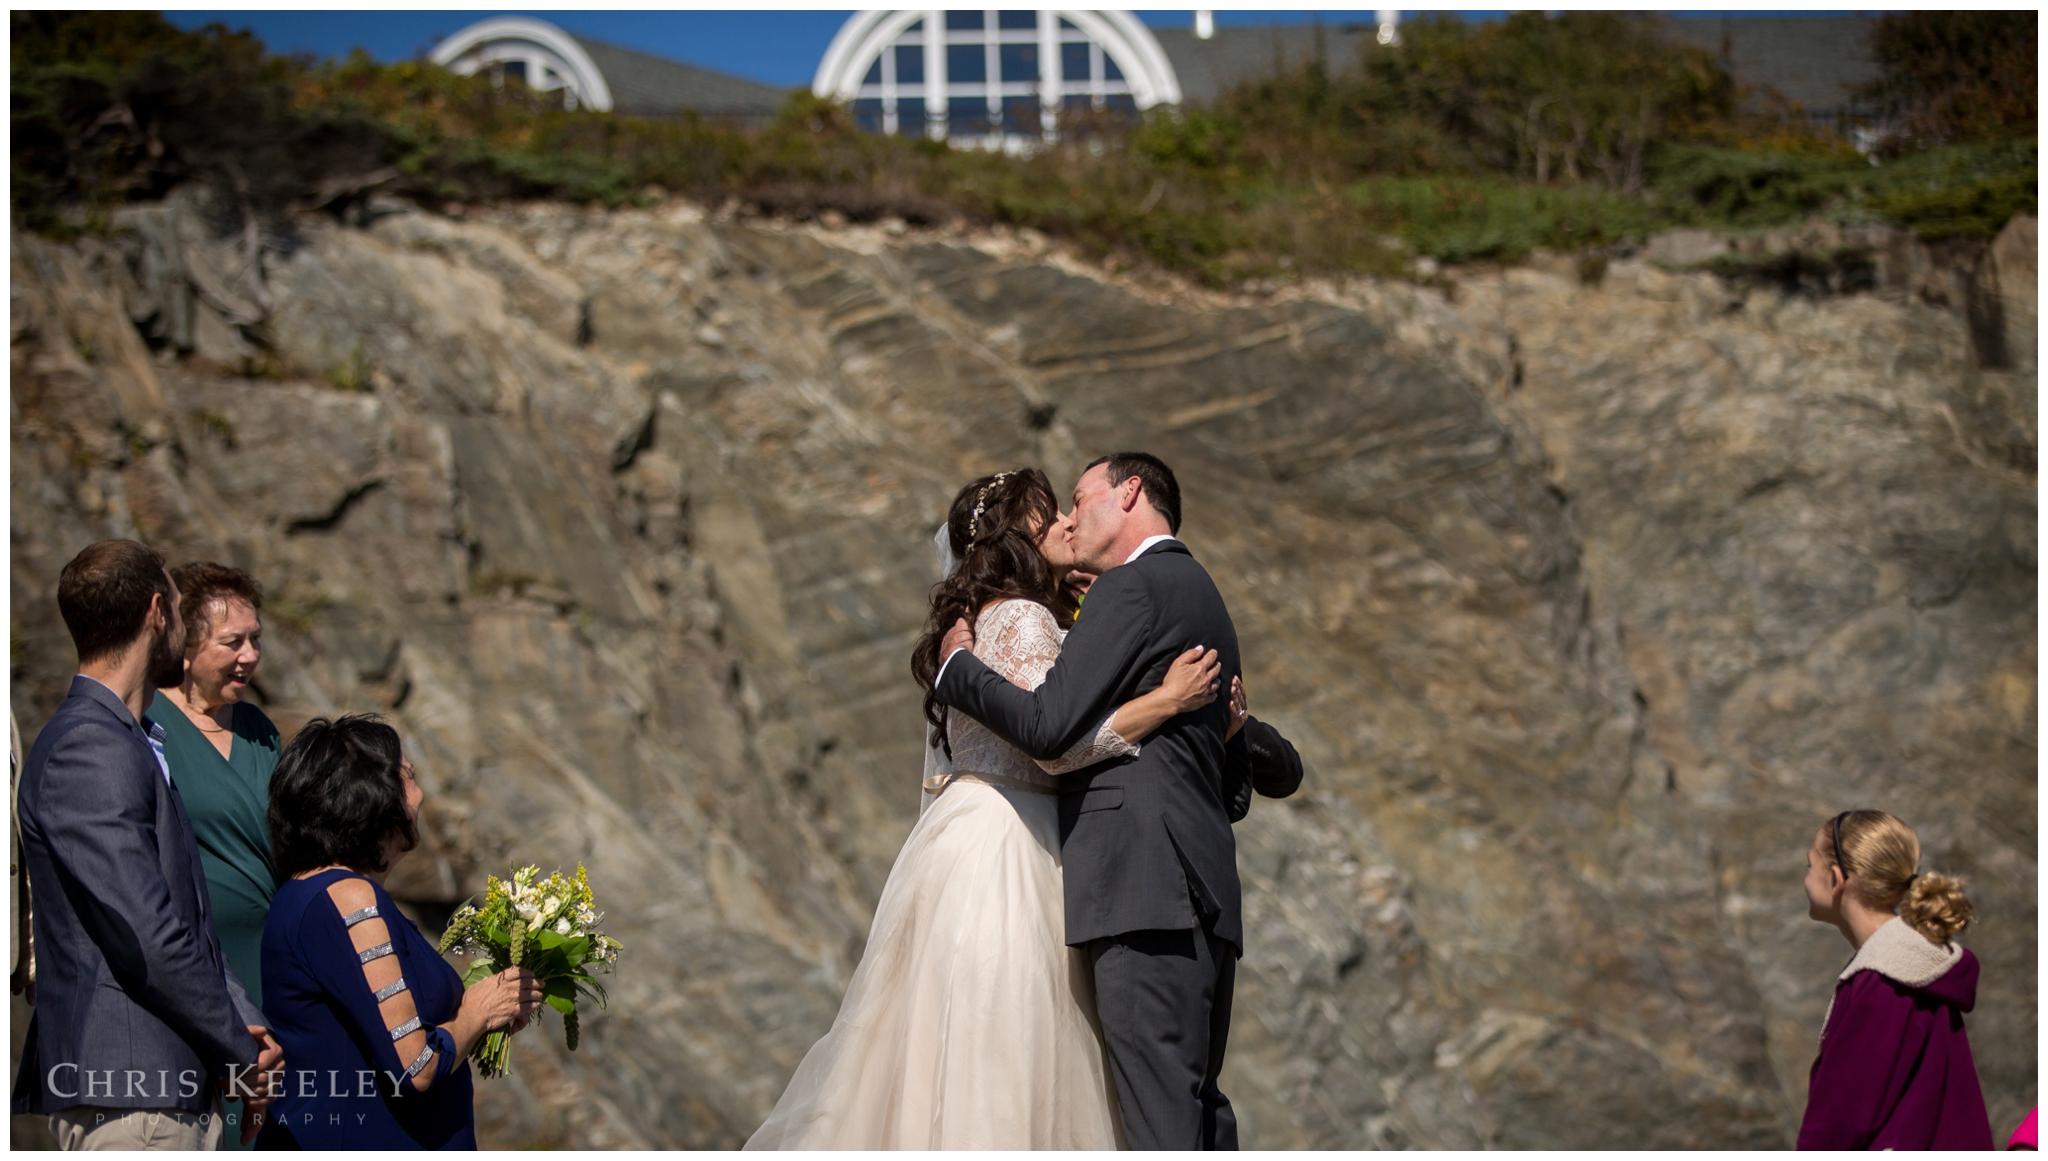 mckenzie-jeff-cliff-house-wedding-new-hampshire-wedding-photographer-chris-keeley-25.jpg